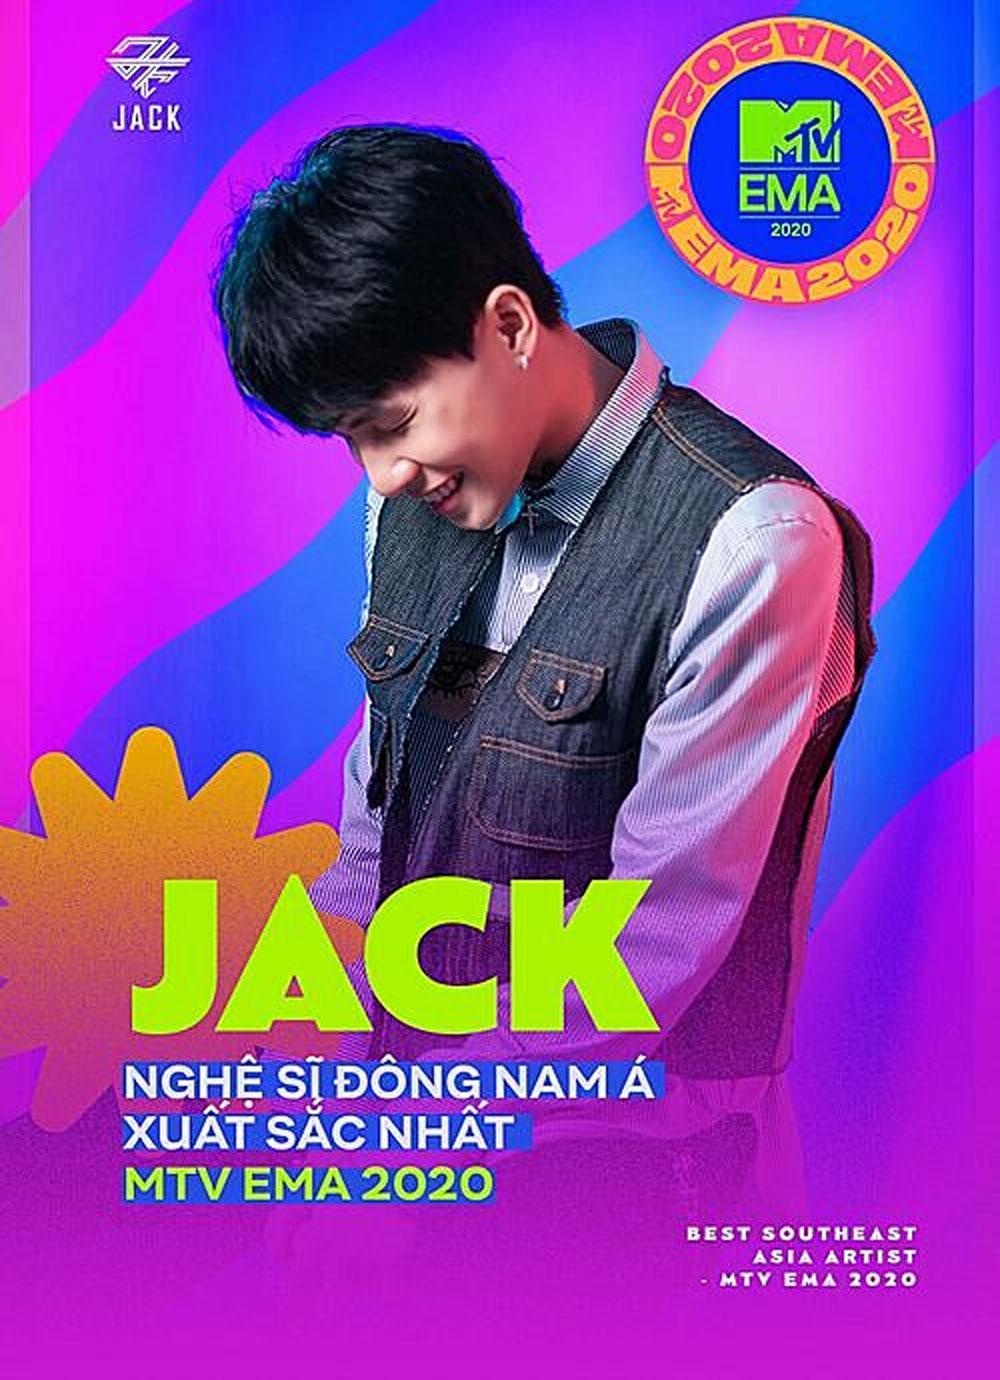 Vietnamese singer, MTV Europe music award, Singer Jack, Best Southeast Asia Act, regional artists, virtual awards ceremony, milestone achievement